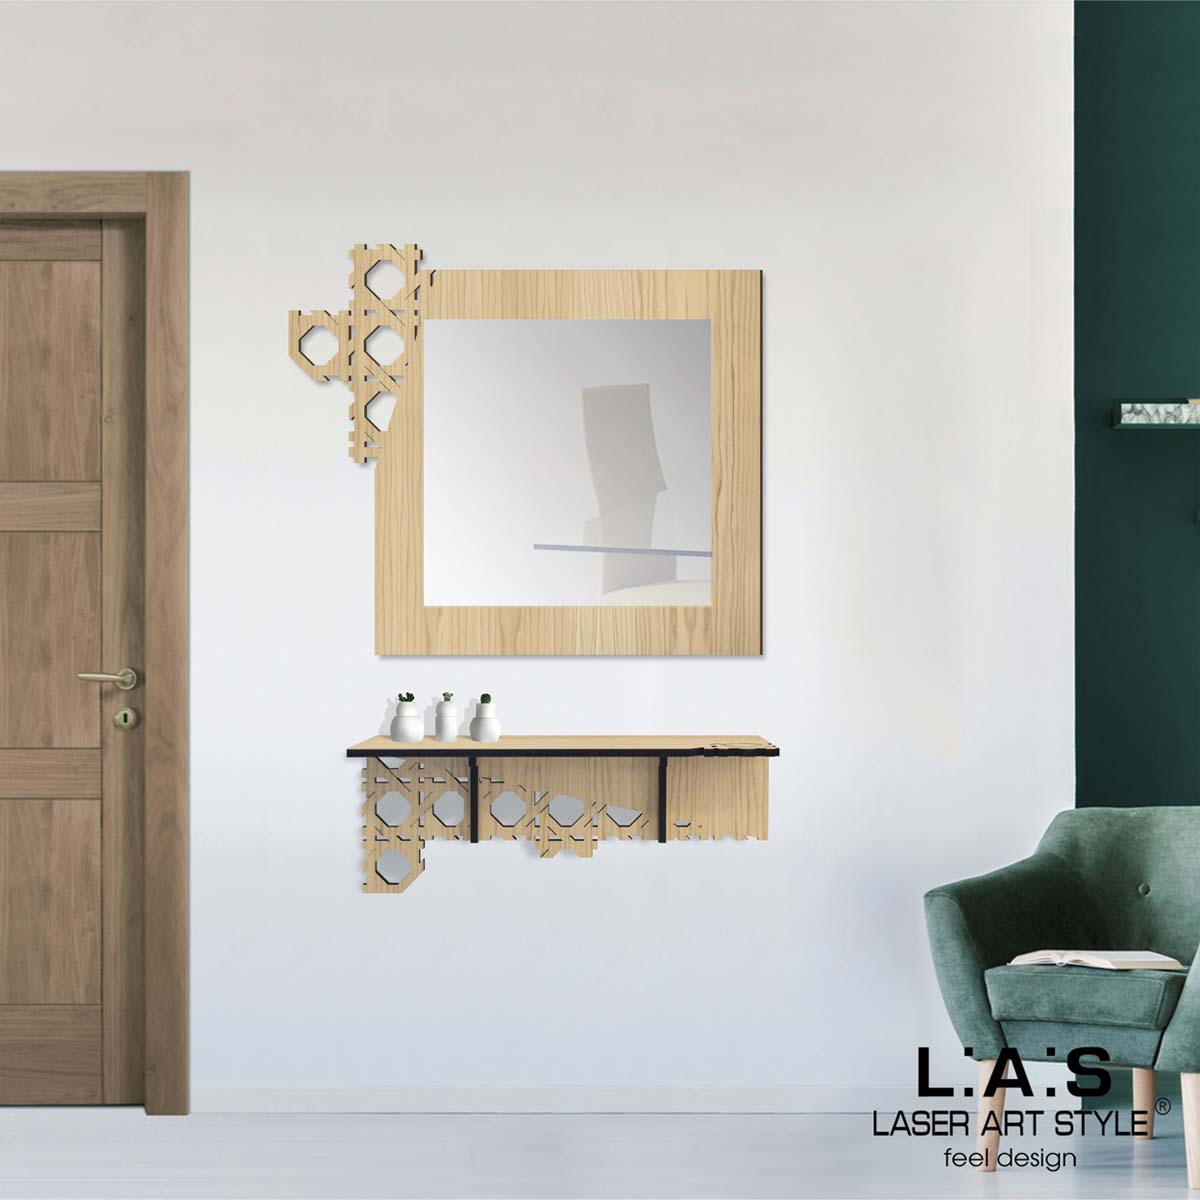 L:A:S - Laser Art Style - SPECCHIERA DESIGN W-409 NATURAL WOOD